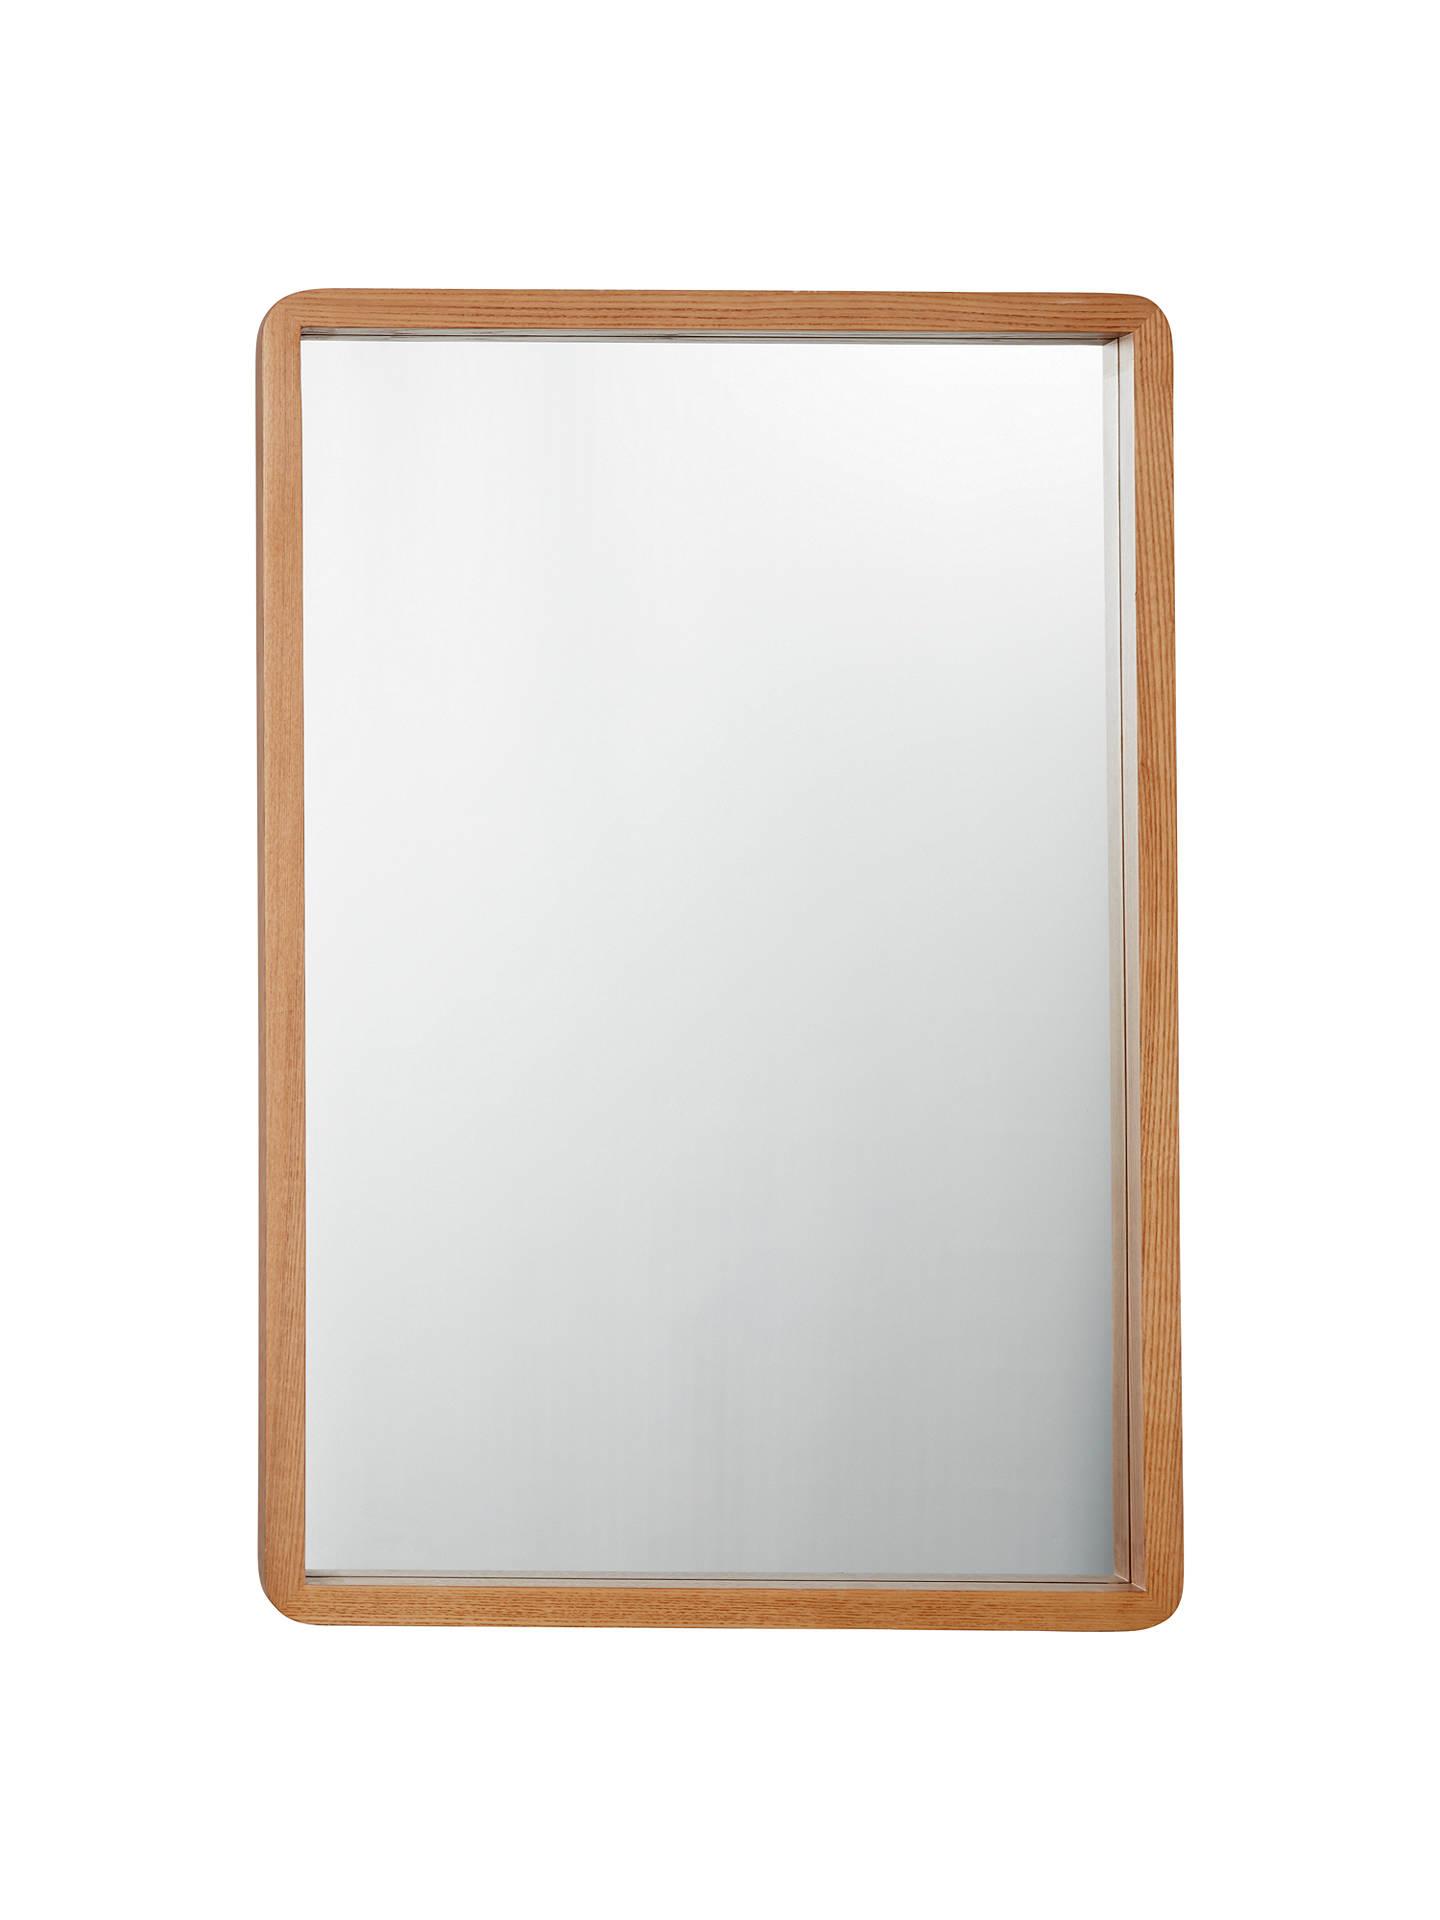 Tilbury round metal mirror set in square frame